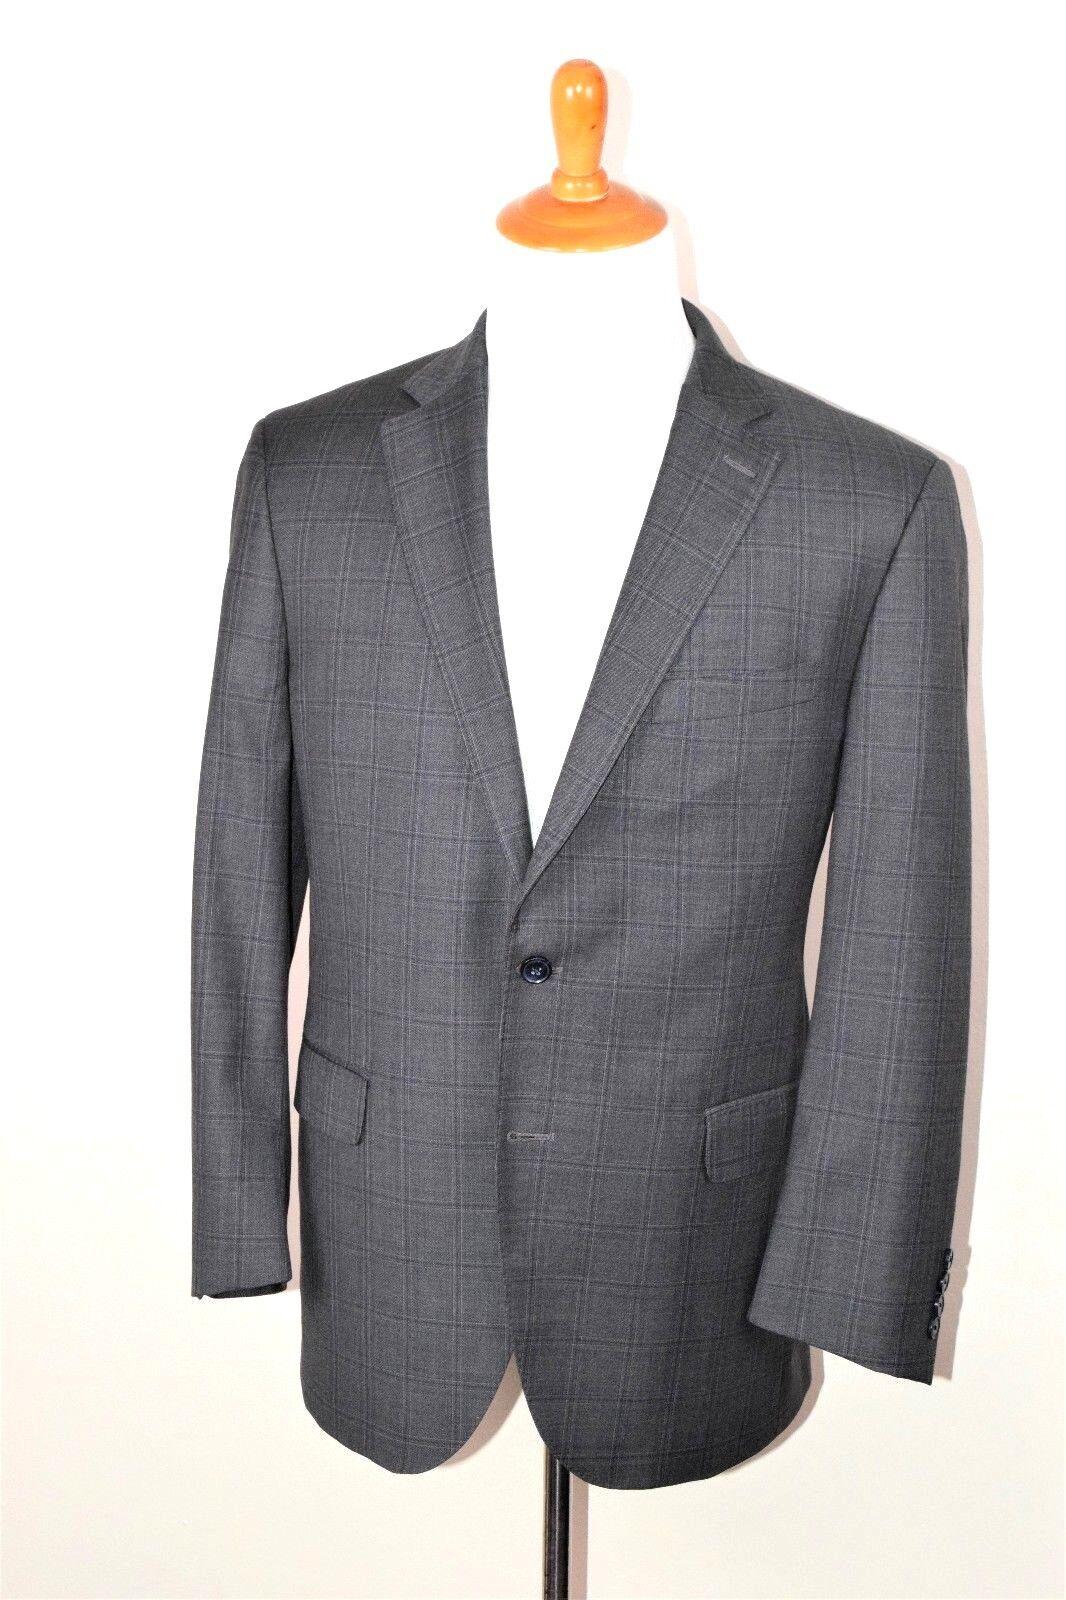 Peter Millar  Herren Charcoal Plaid Suit Four Seasons 100% Loro Piana Wool 42R 32W